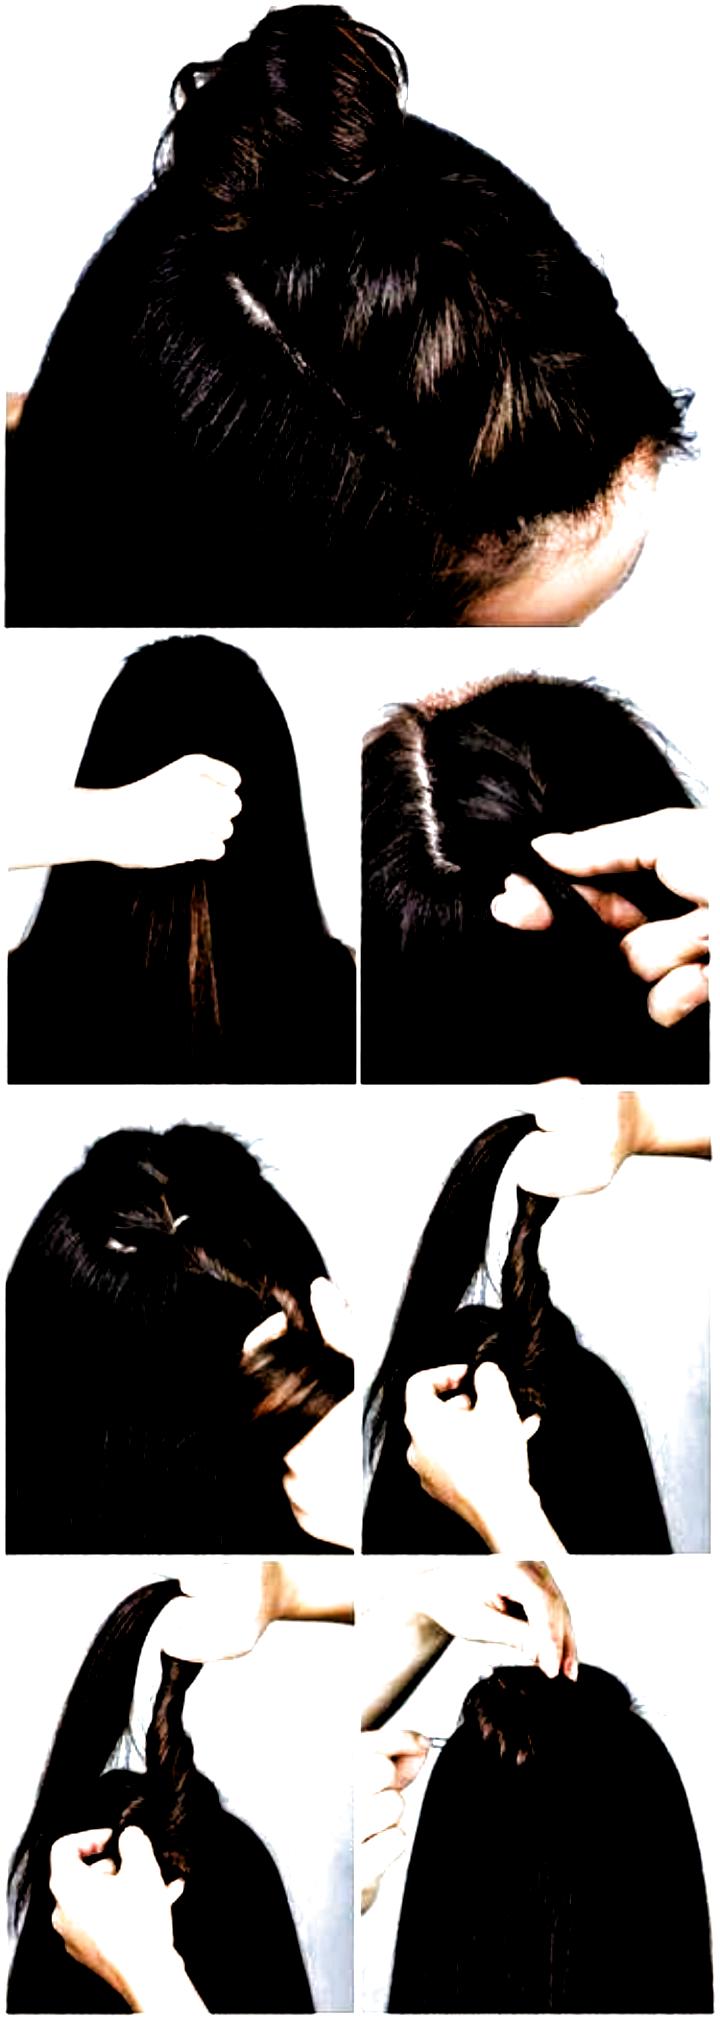 Best Hairstyles For Medium Length Hair Formal Messy Buns 50 Ideas Best Hairstyles For Medium Length